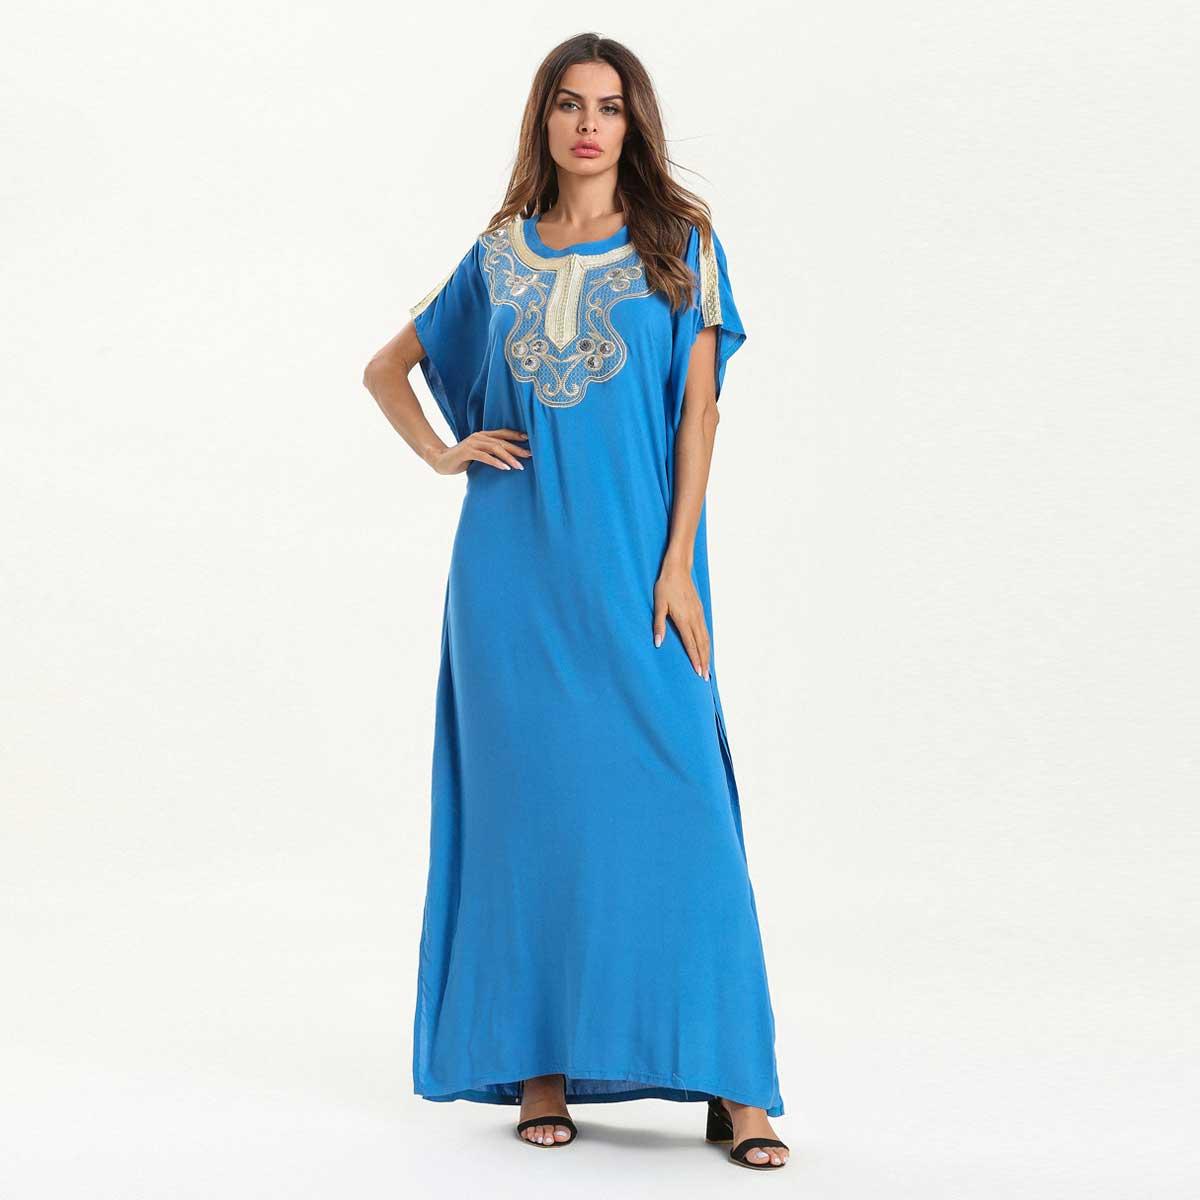 Verano bordado bohemio Maxi vestido con diseño de lentejuelas manga de murciélago azul Abaya musulmana Dubái islámico UAE árabe Túnica de algodón VKDR1560